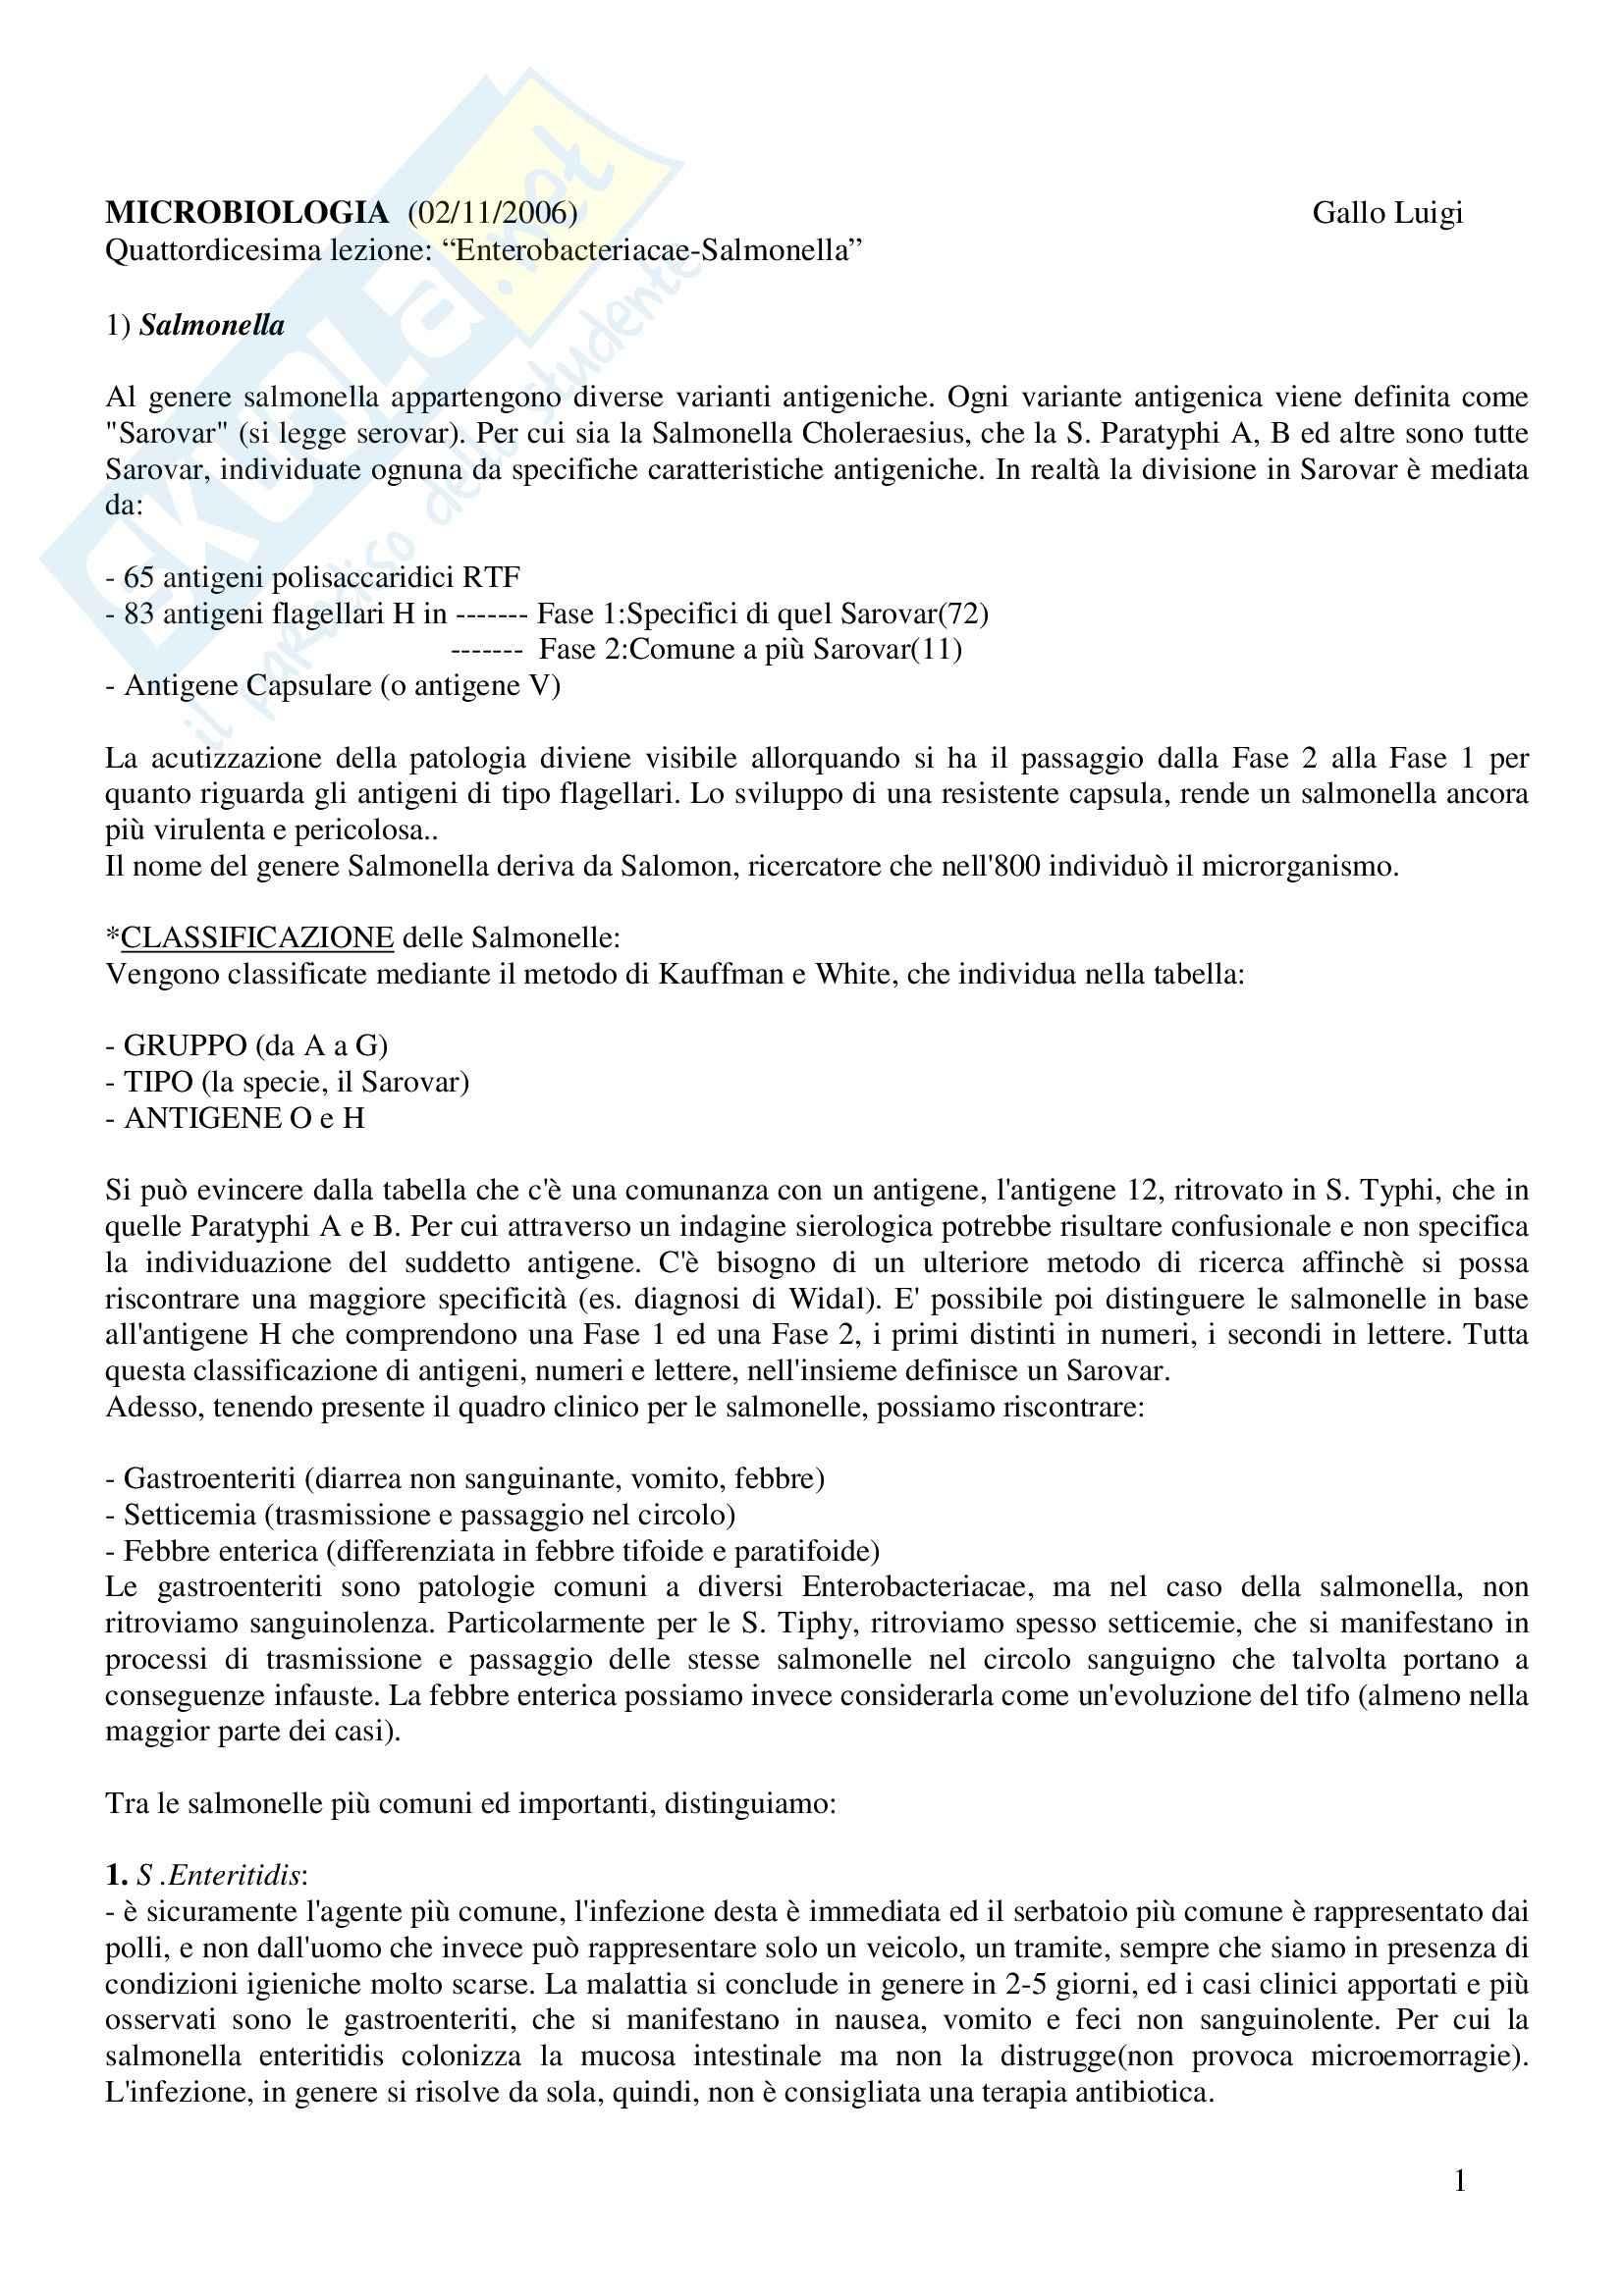 Microbiologia - enterobacteriacae salmonella